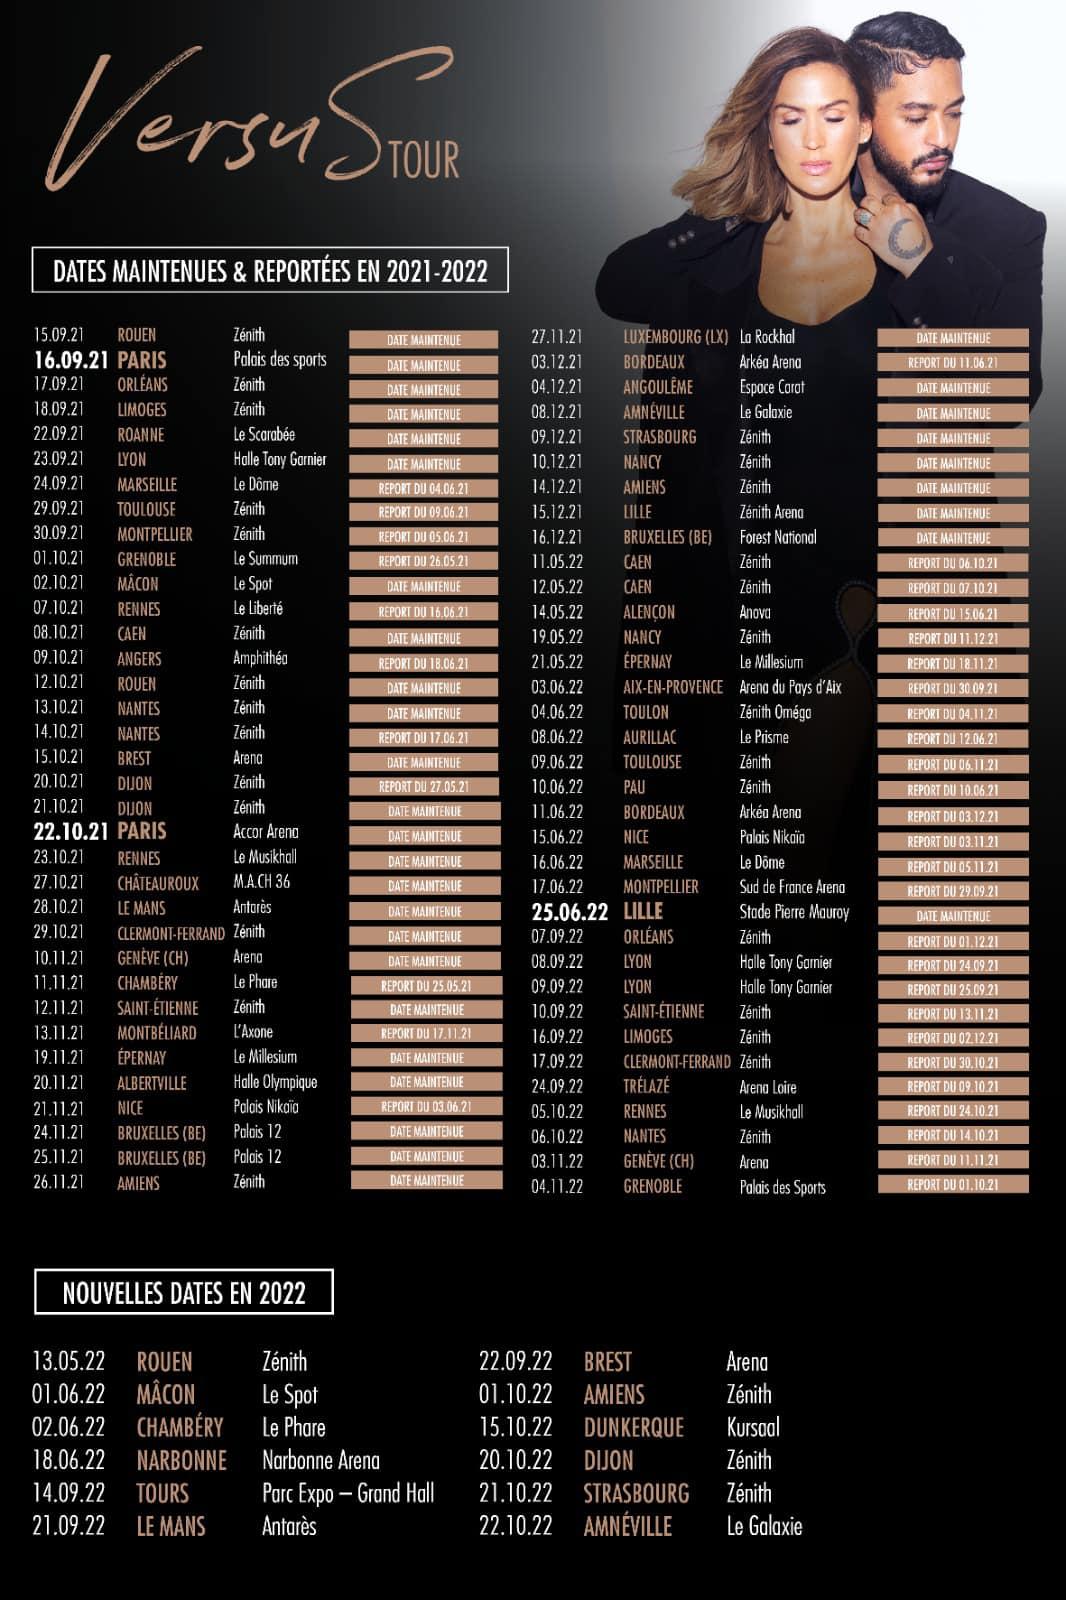 Vitaa Slimane - VersuS Tour - 2021 2022 -